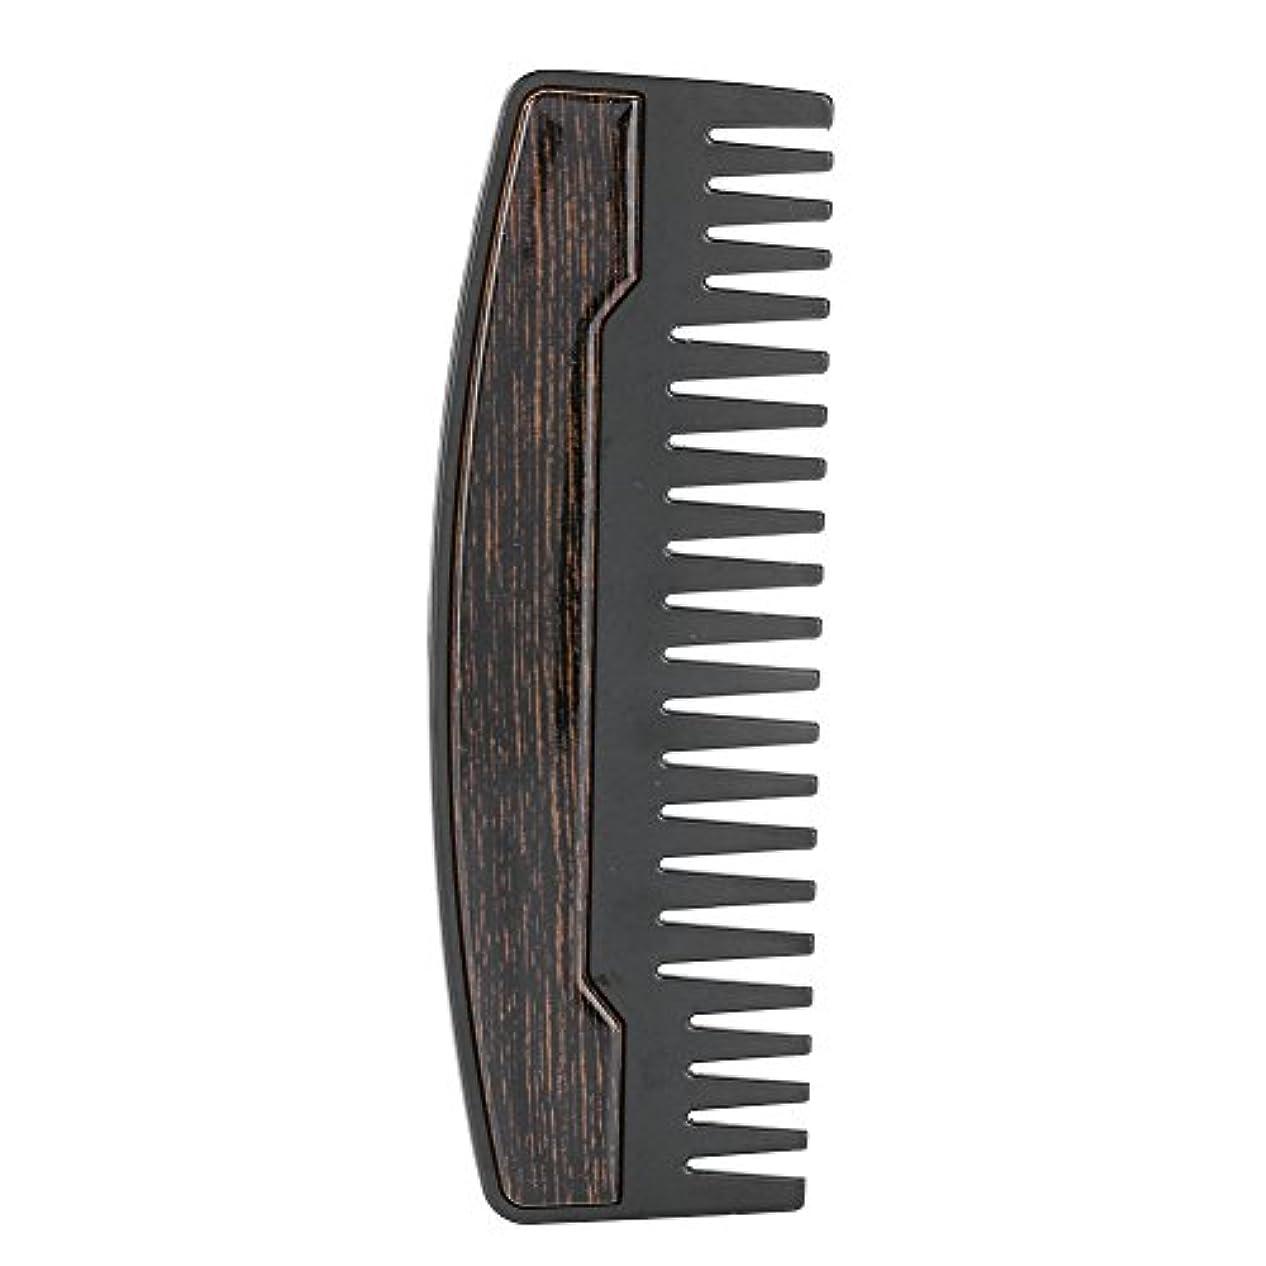 Ochun コーム 櫛 ステンレス製 粗目 髪/髭用メンズ 耐用 静電気を防止 持ち運びに便利 高級感 ブラック木目 2タイプ選択可能 洗面用具(木目)